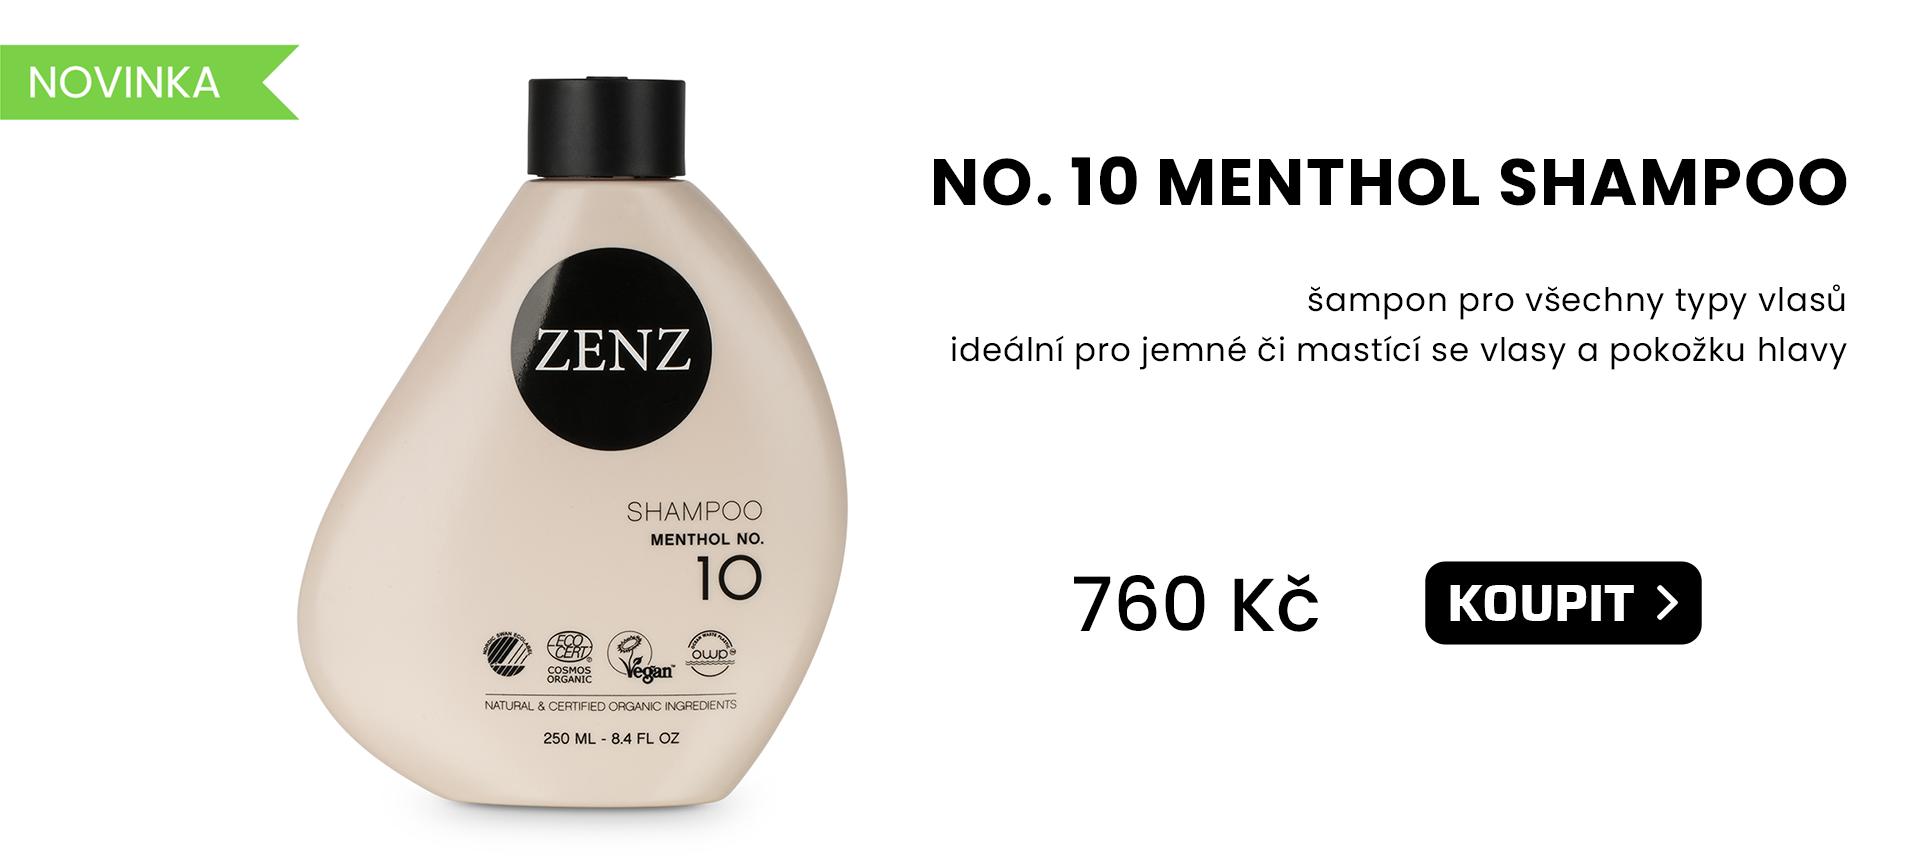 Zenz organic - NO. 10 MENTHOL Shampoo